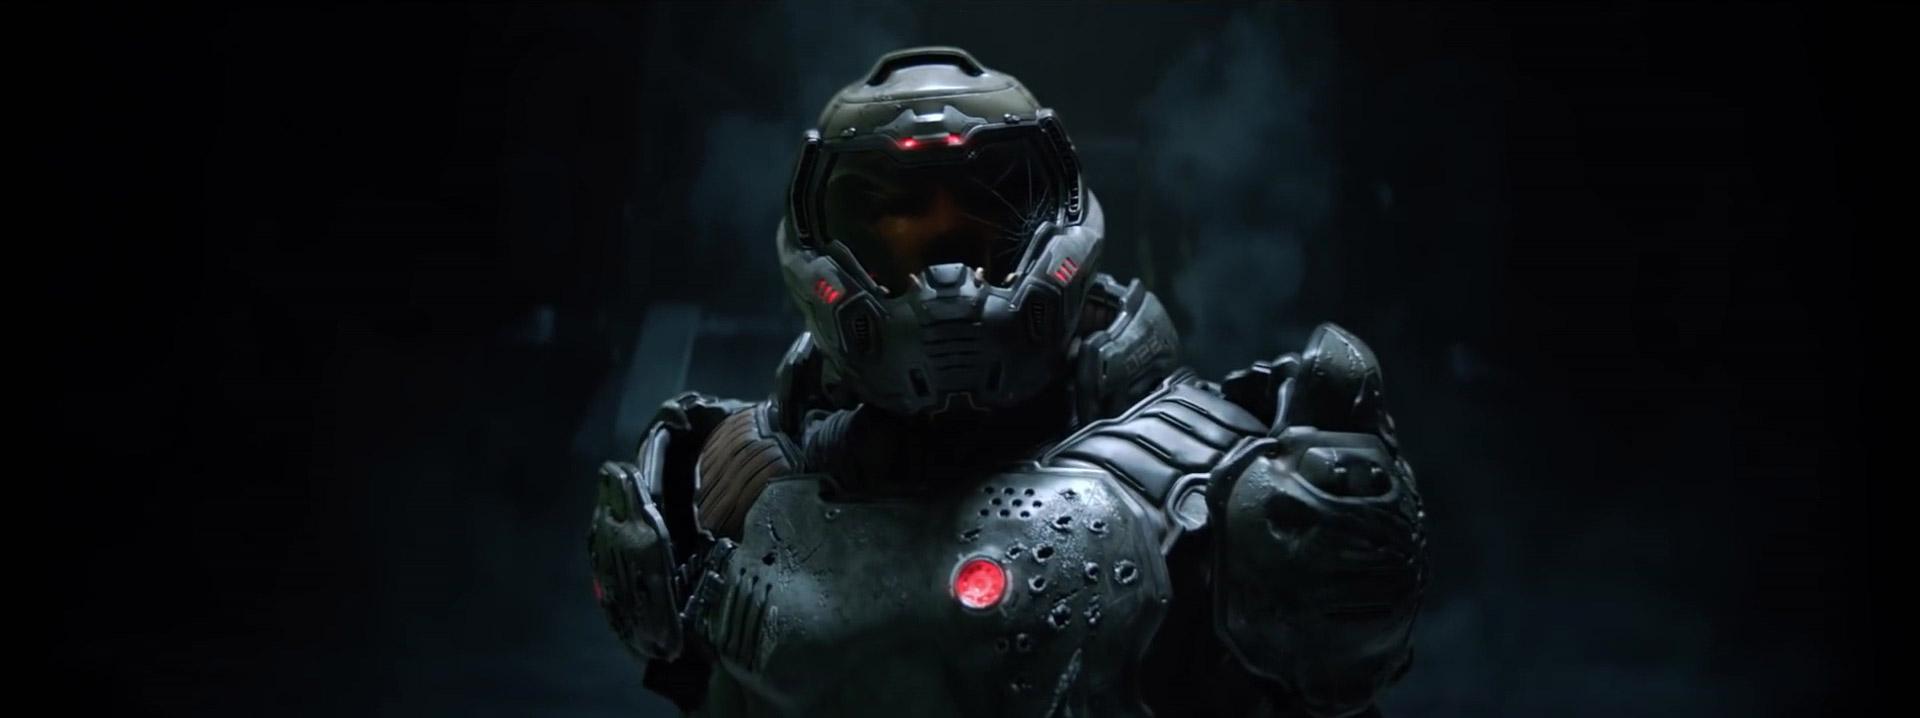 doom-2016-video-game-trailer-5